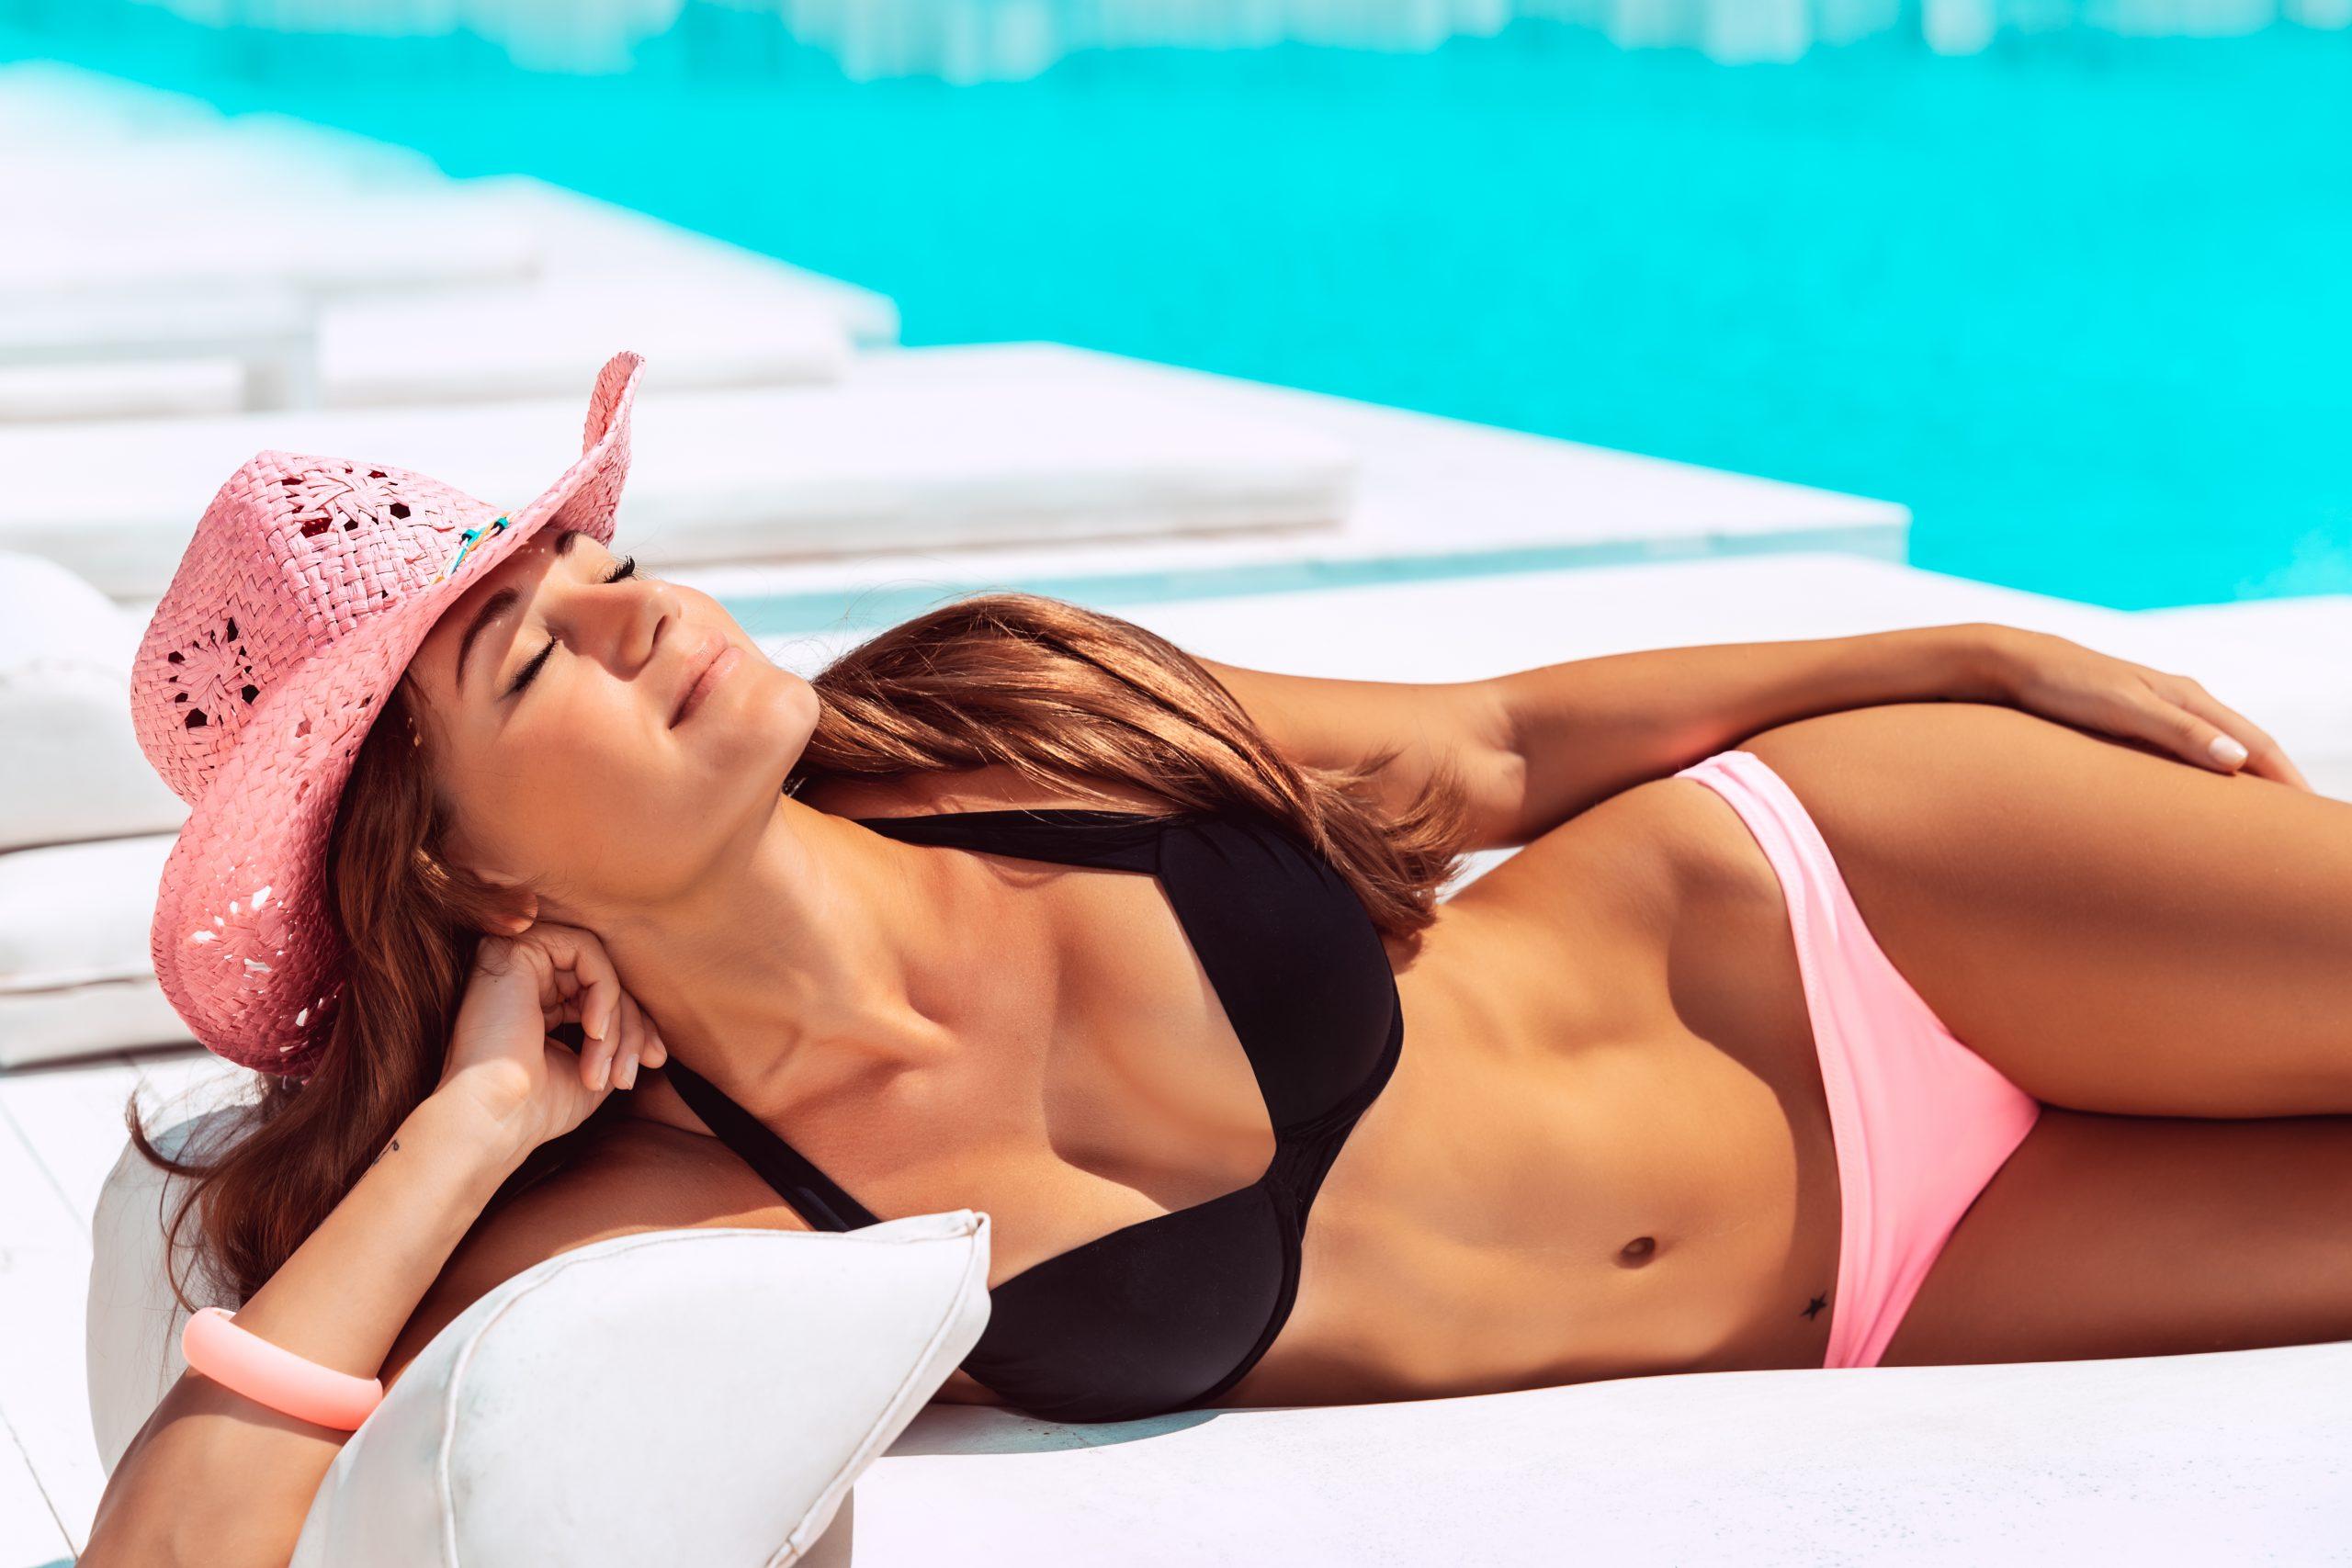 Beautiful Woman Tanning On The Pool